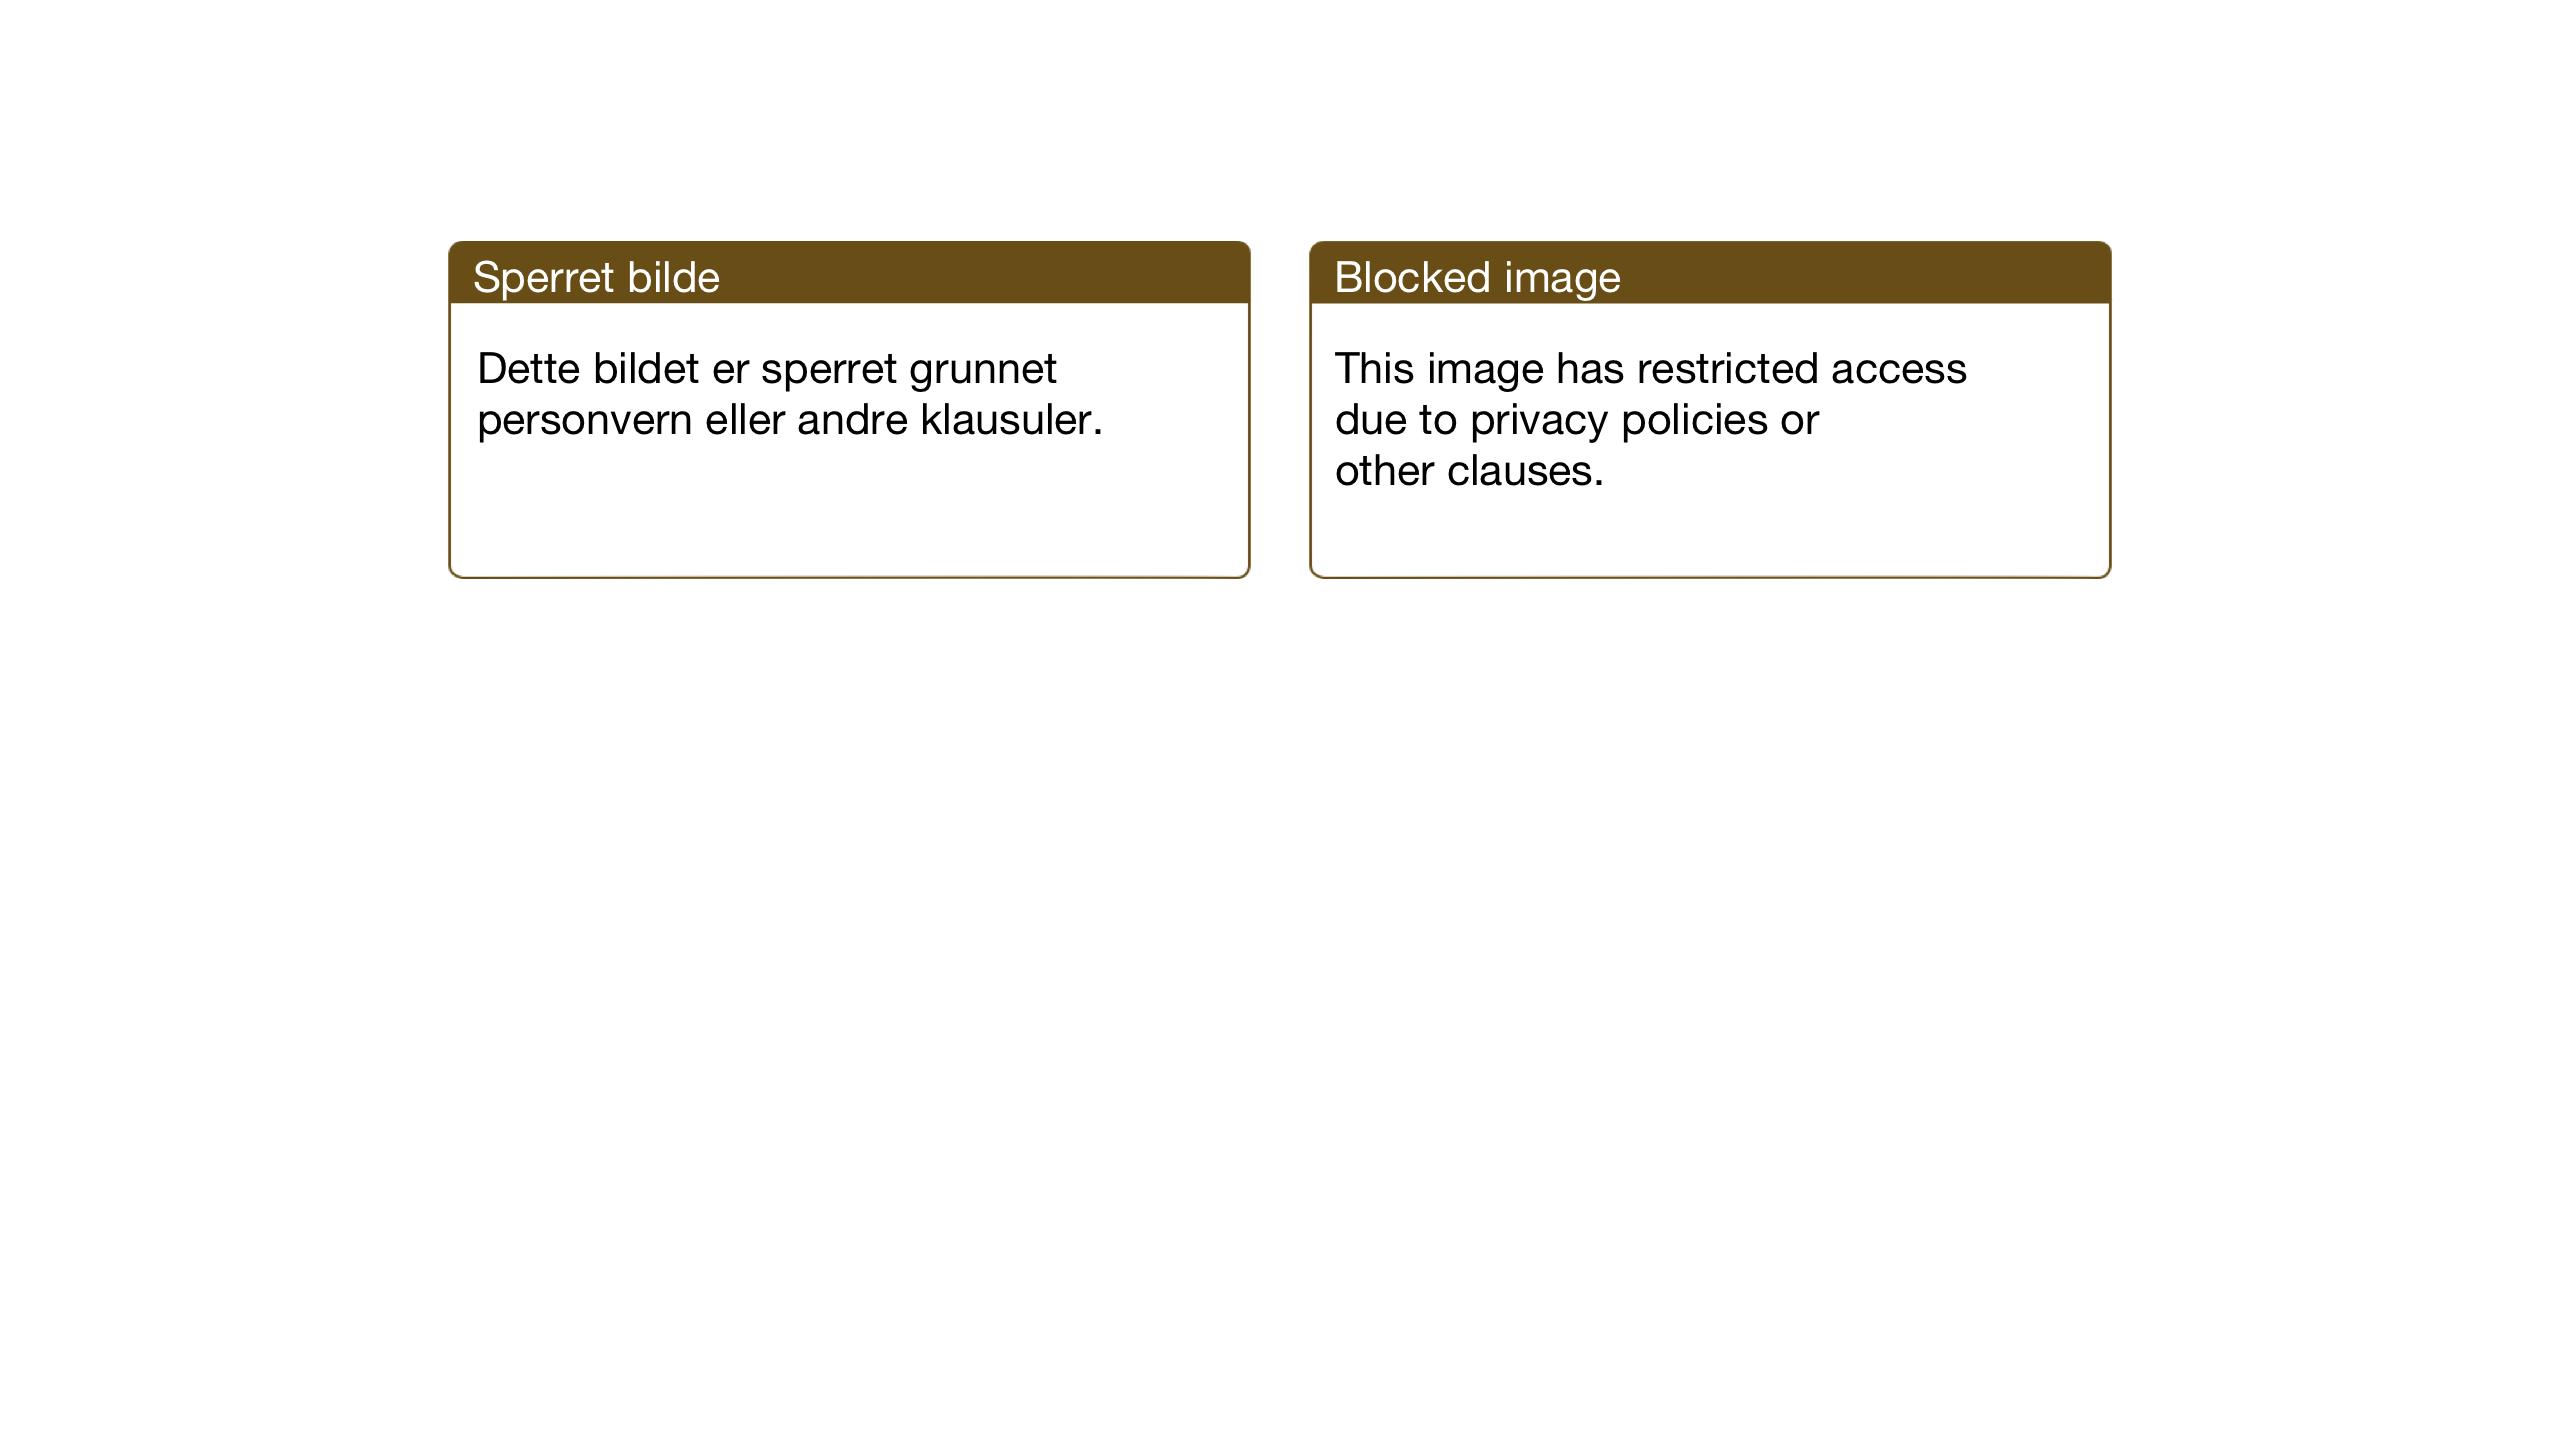 SAT, Ministerialprotokoller, klokkerbøker og fødselsregistre - Nordland, 847/L0680: Klokkerbok nr. 847C08, 1930-1947, s. 73